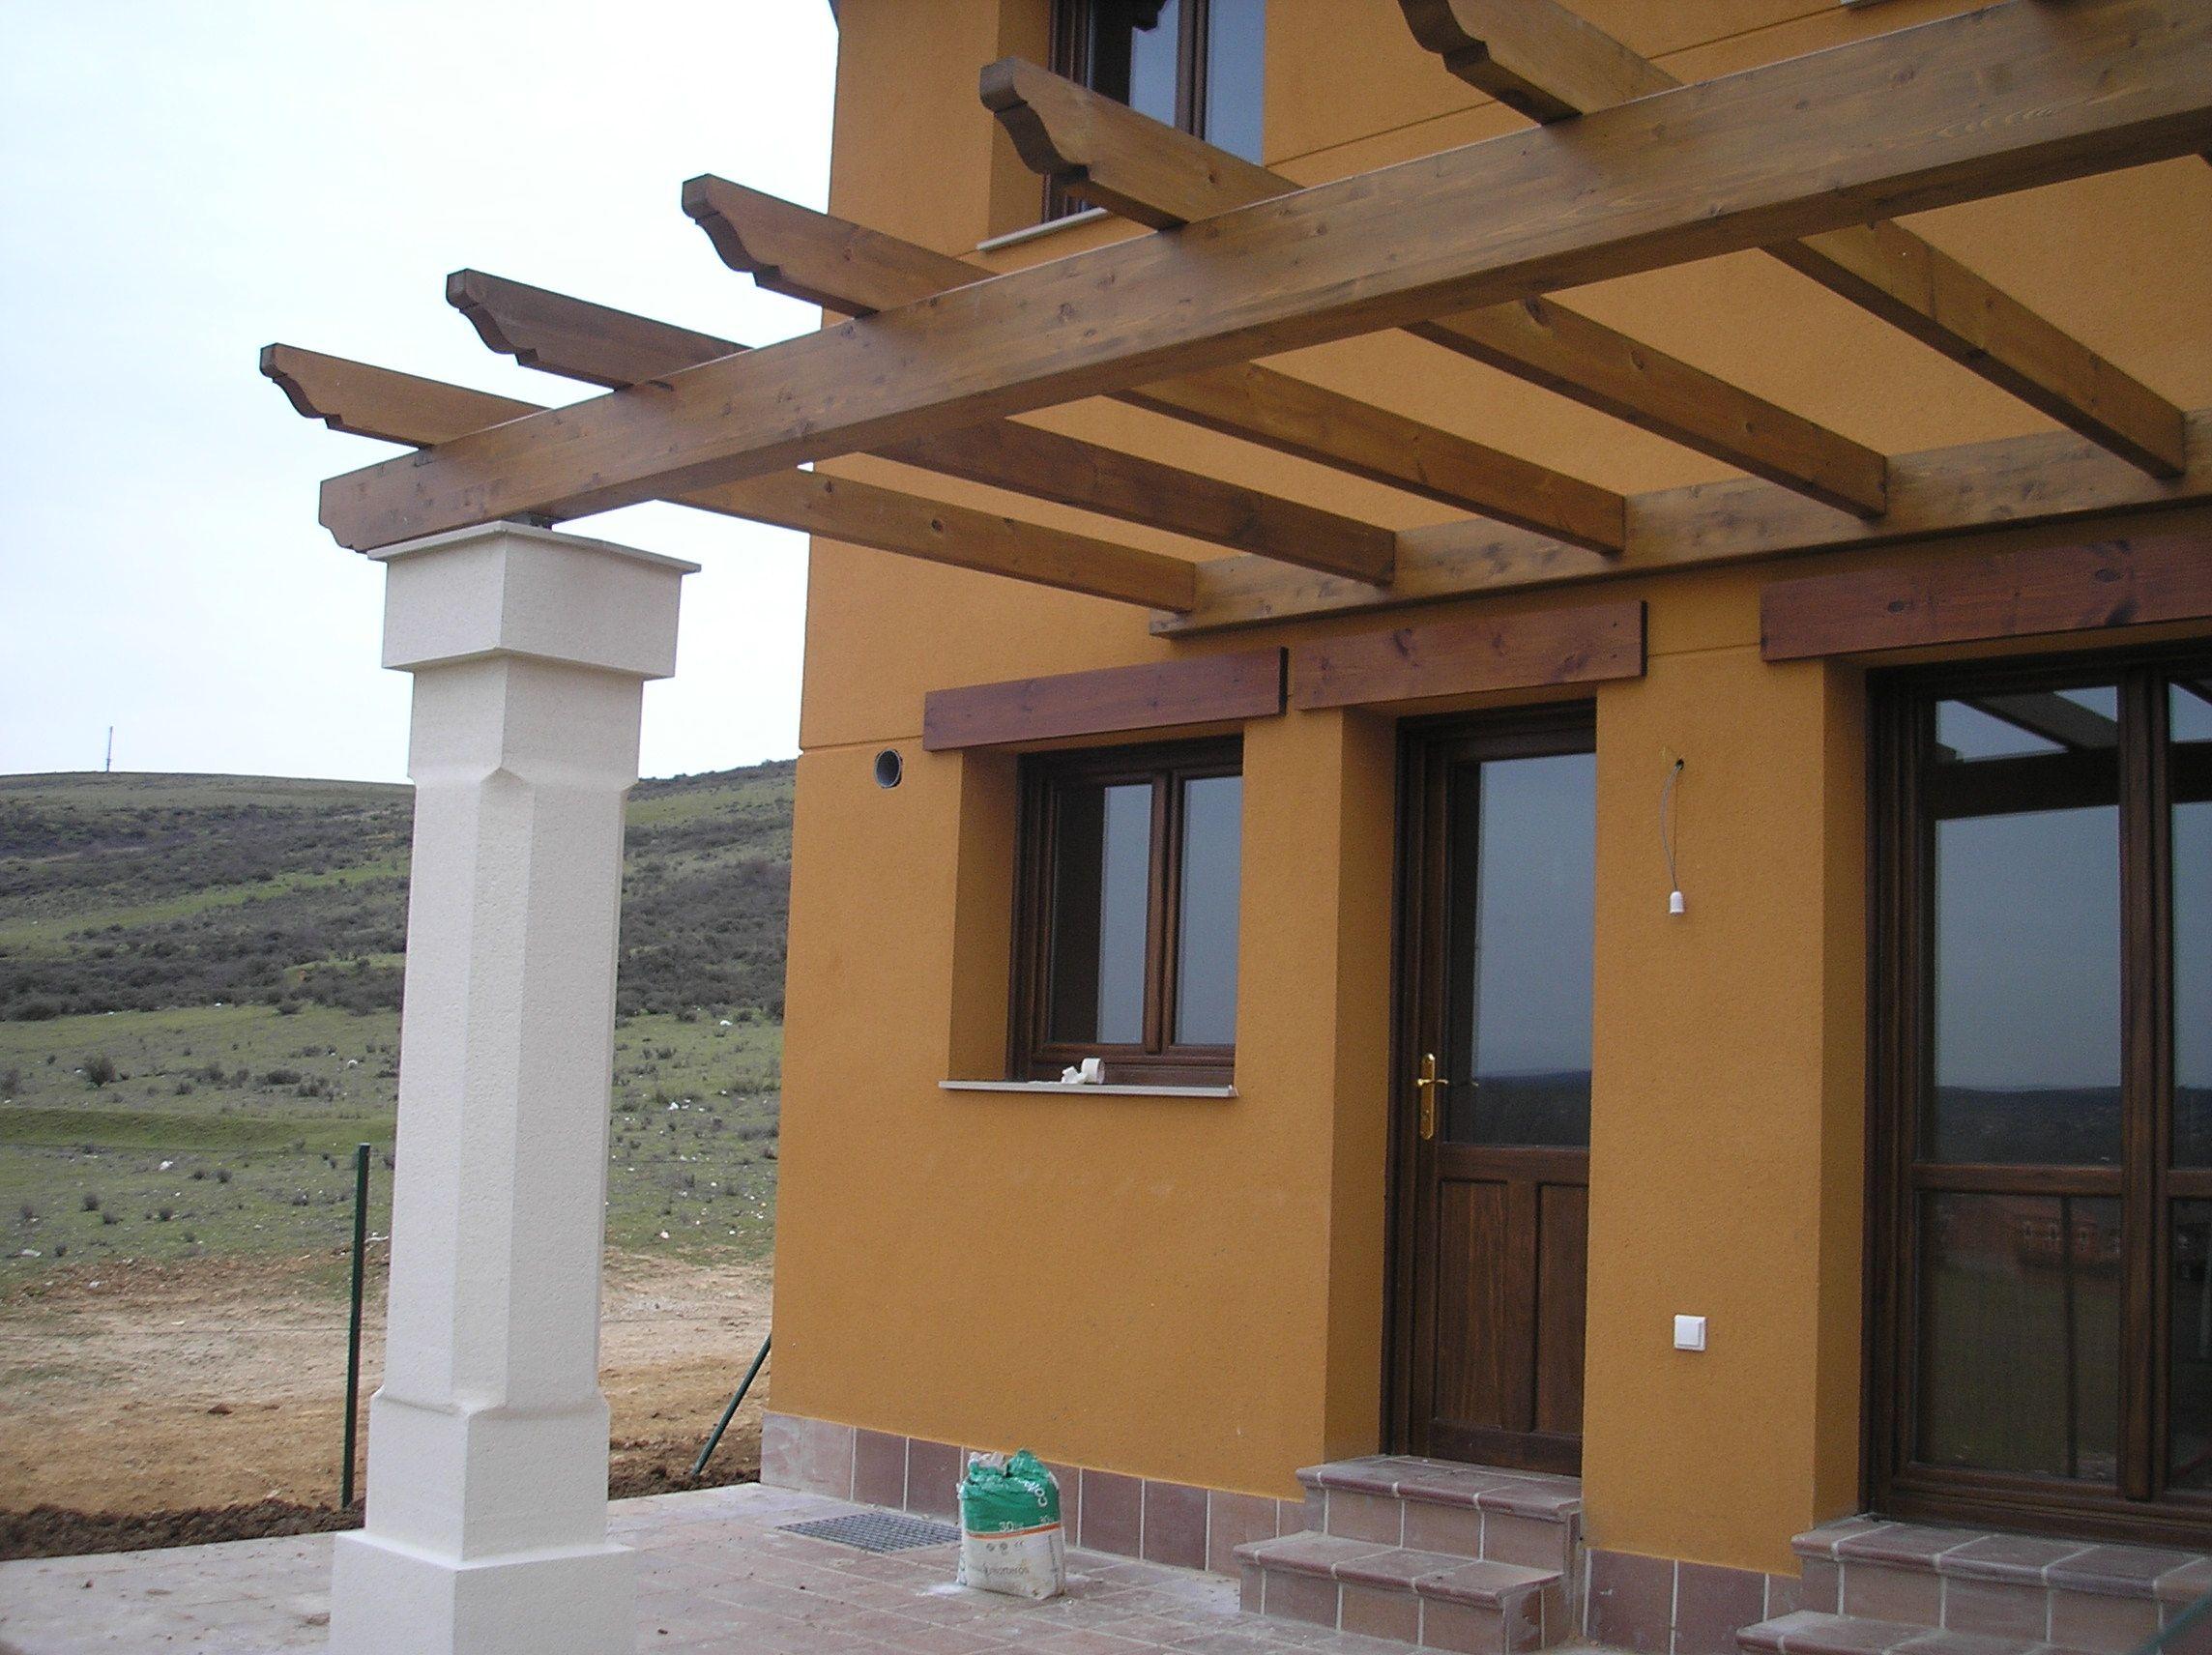 proyecto de prgola para la urbanizacin la peralina en len prgola en madera sobre columnas